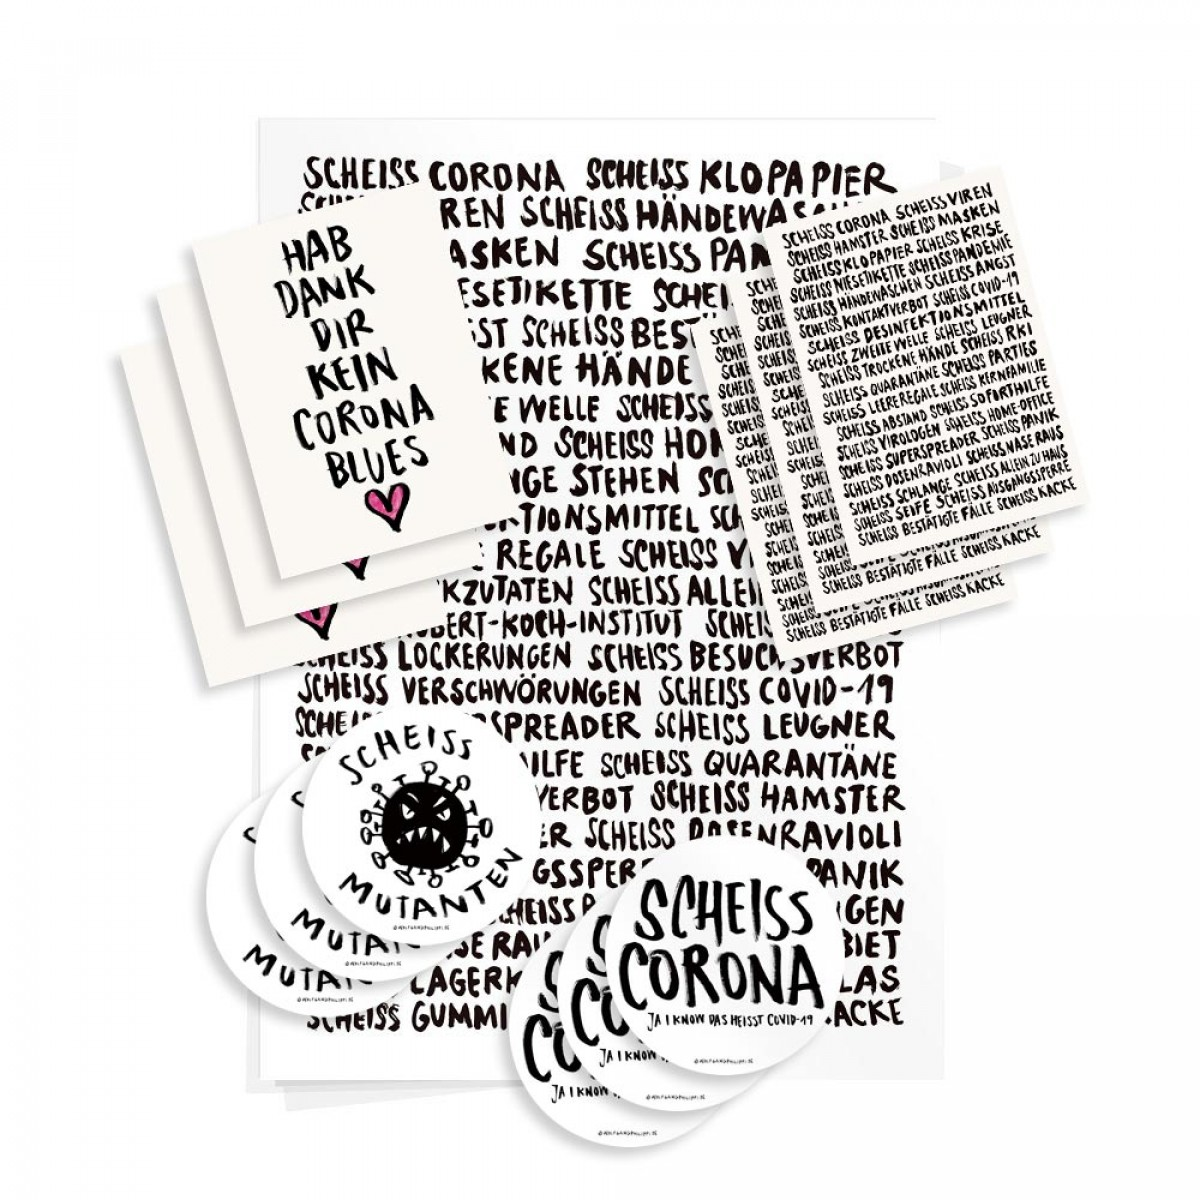 Wolfgang Philippi CORONA SOFORTHILFE Paket (1 Plakat, 6 Karten, 6 Aufkleber)